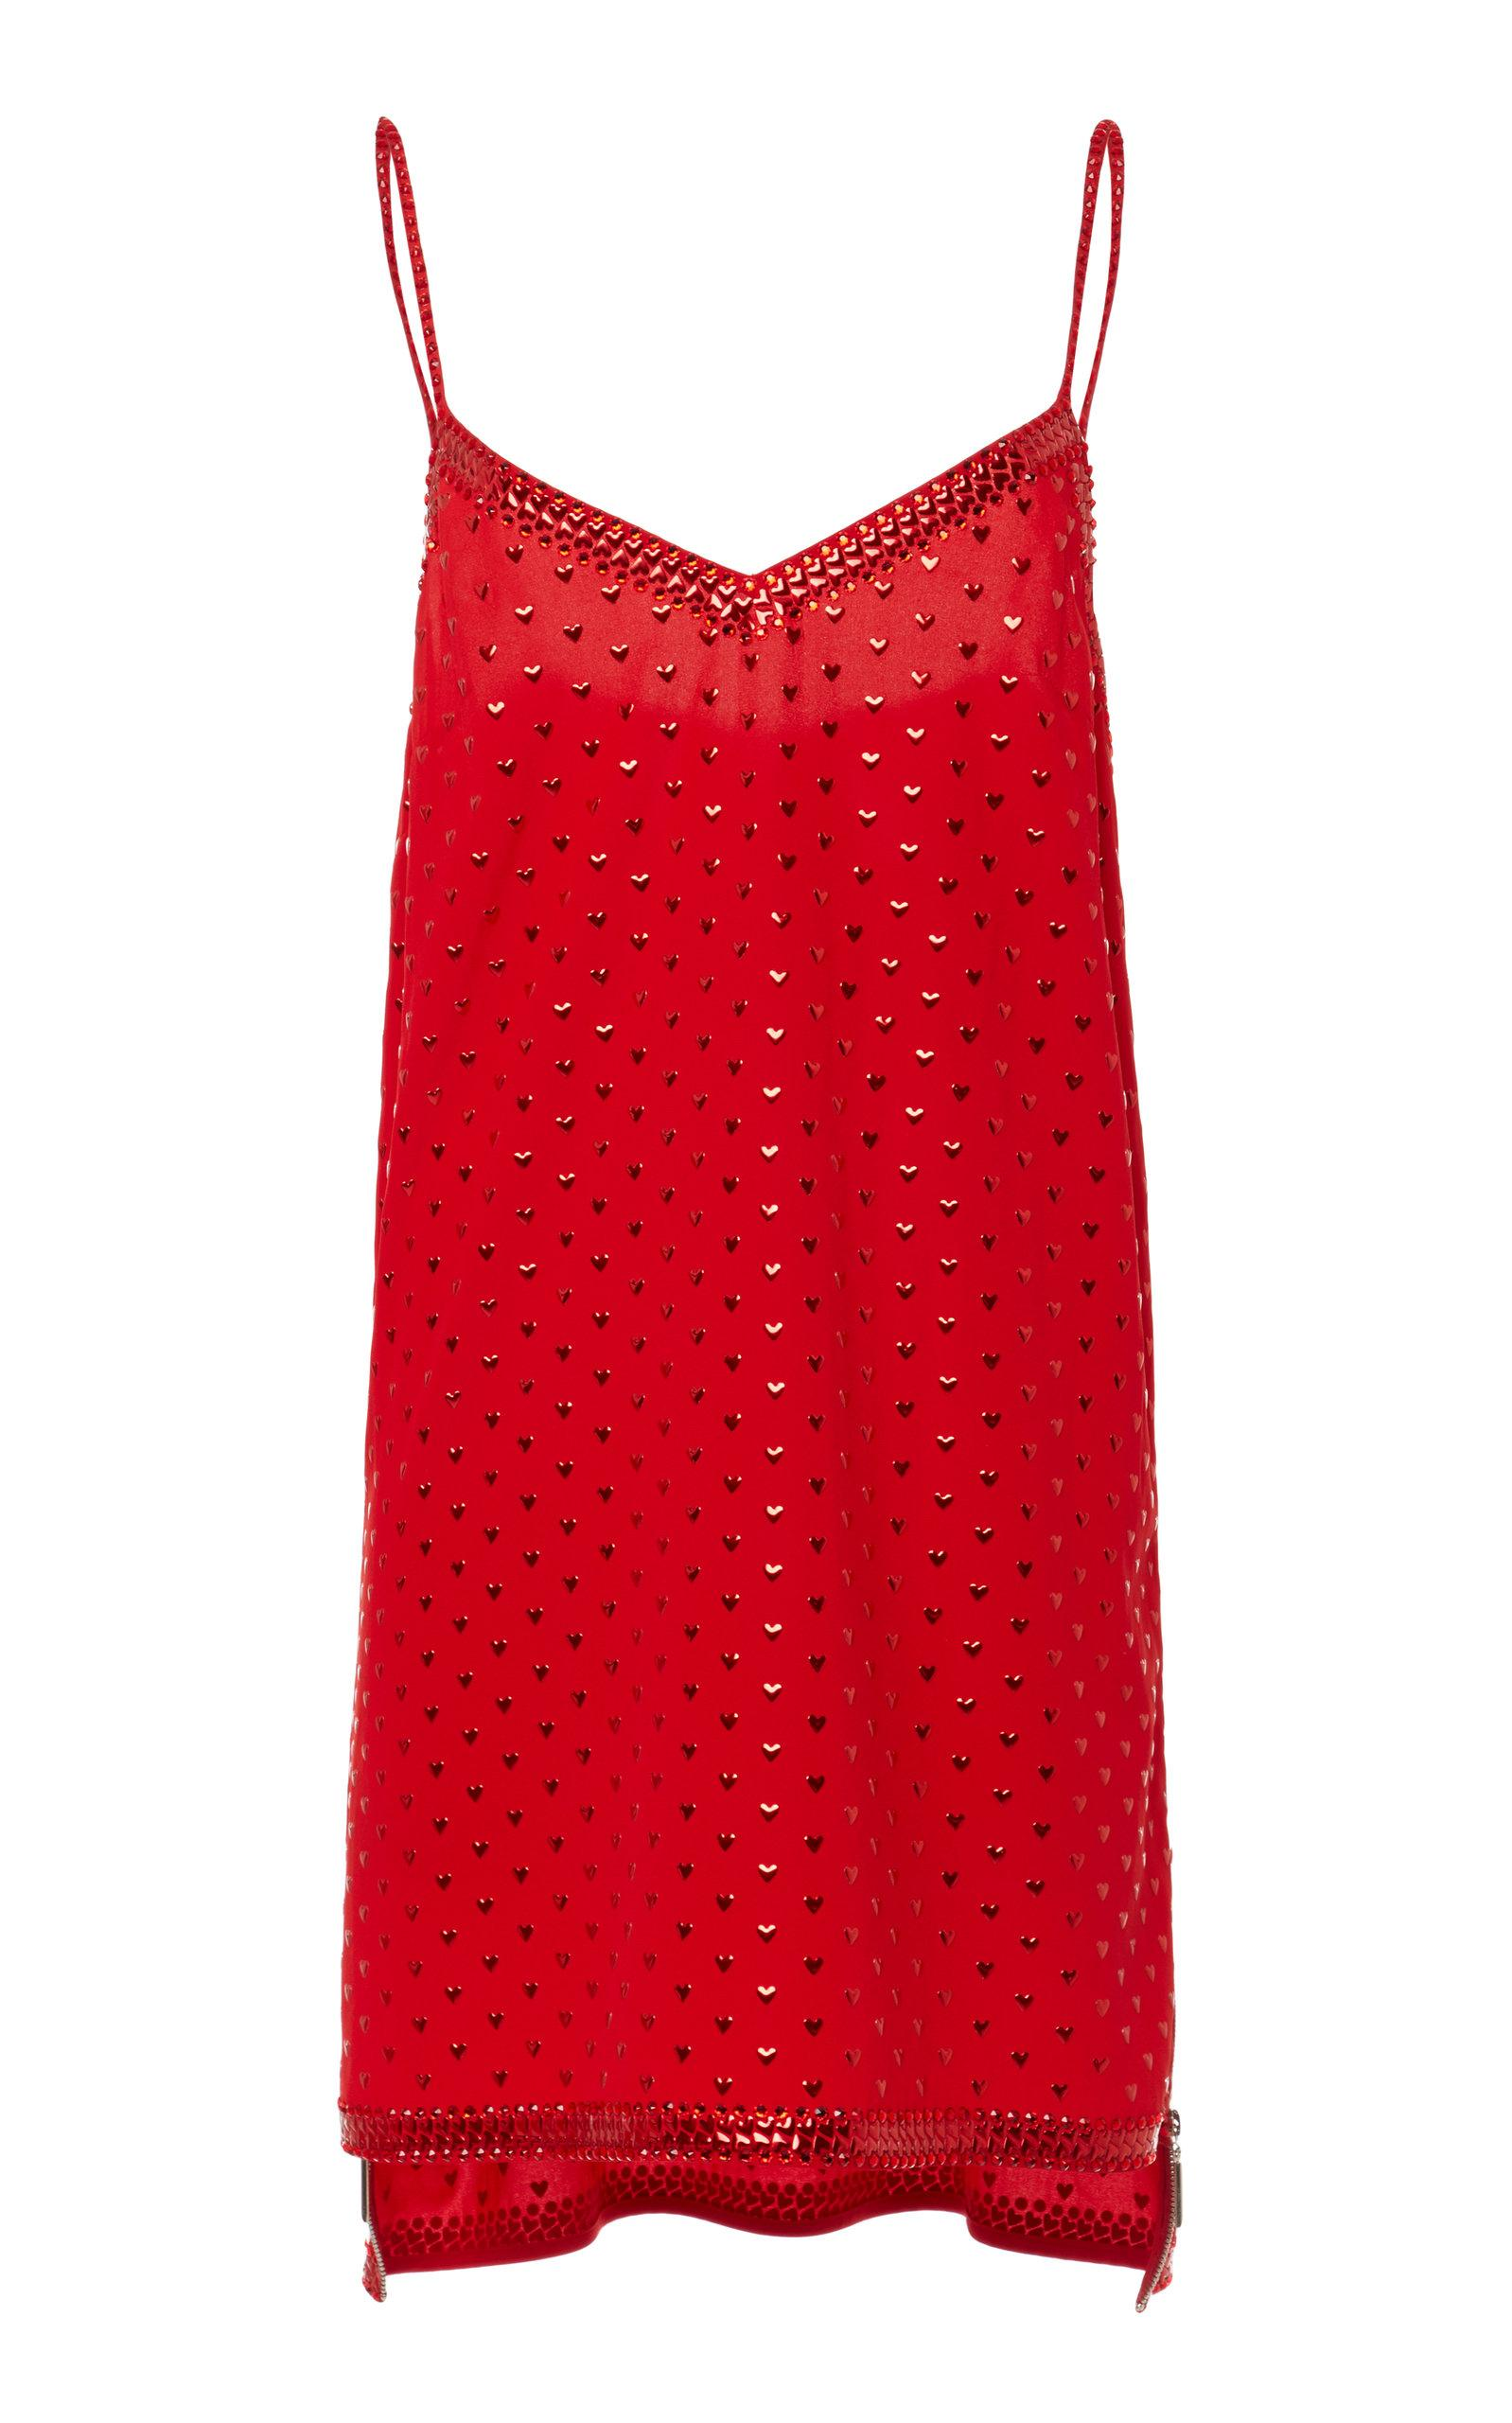 Adam Selman Mini Slip Dress In Red